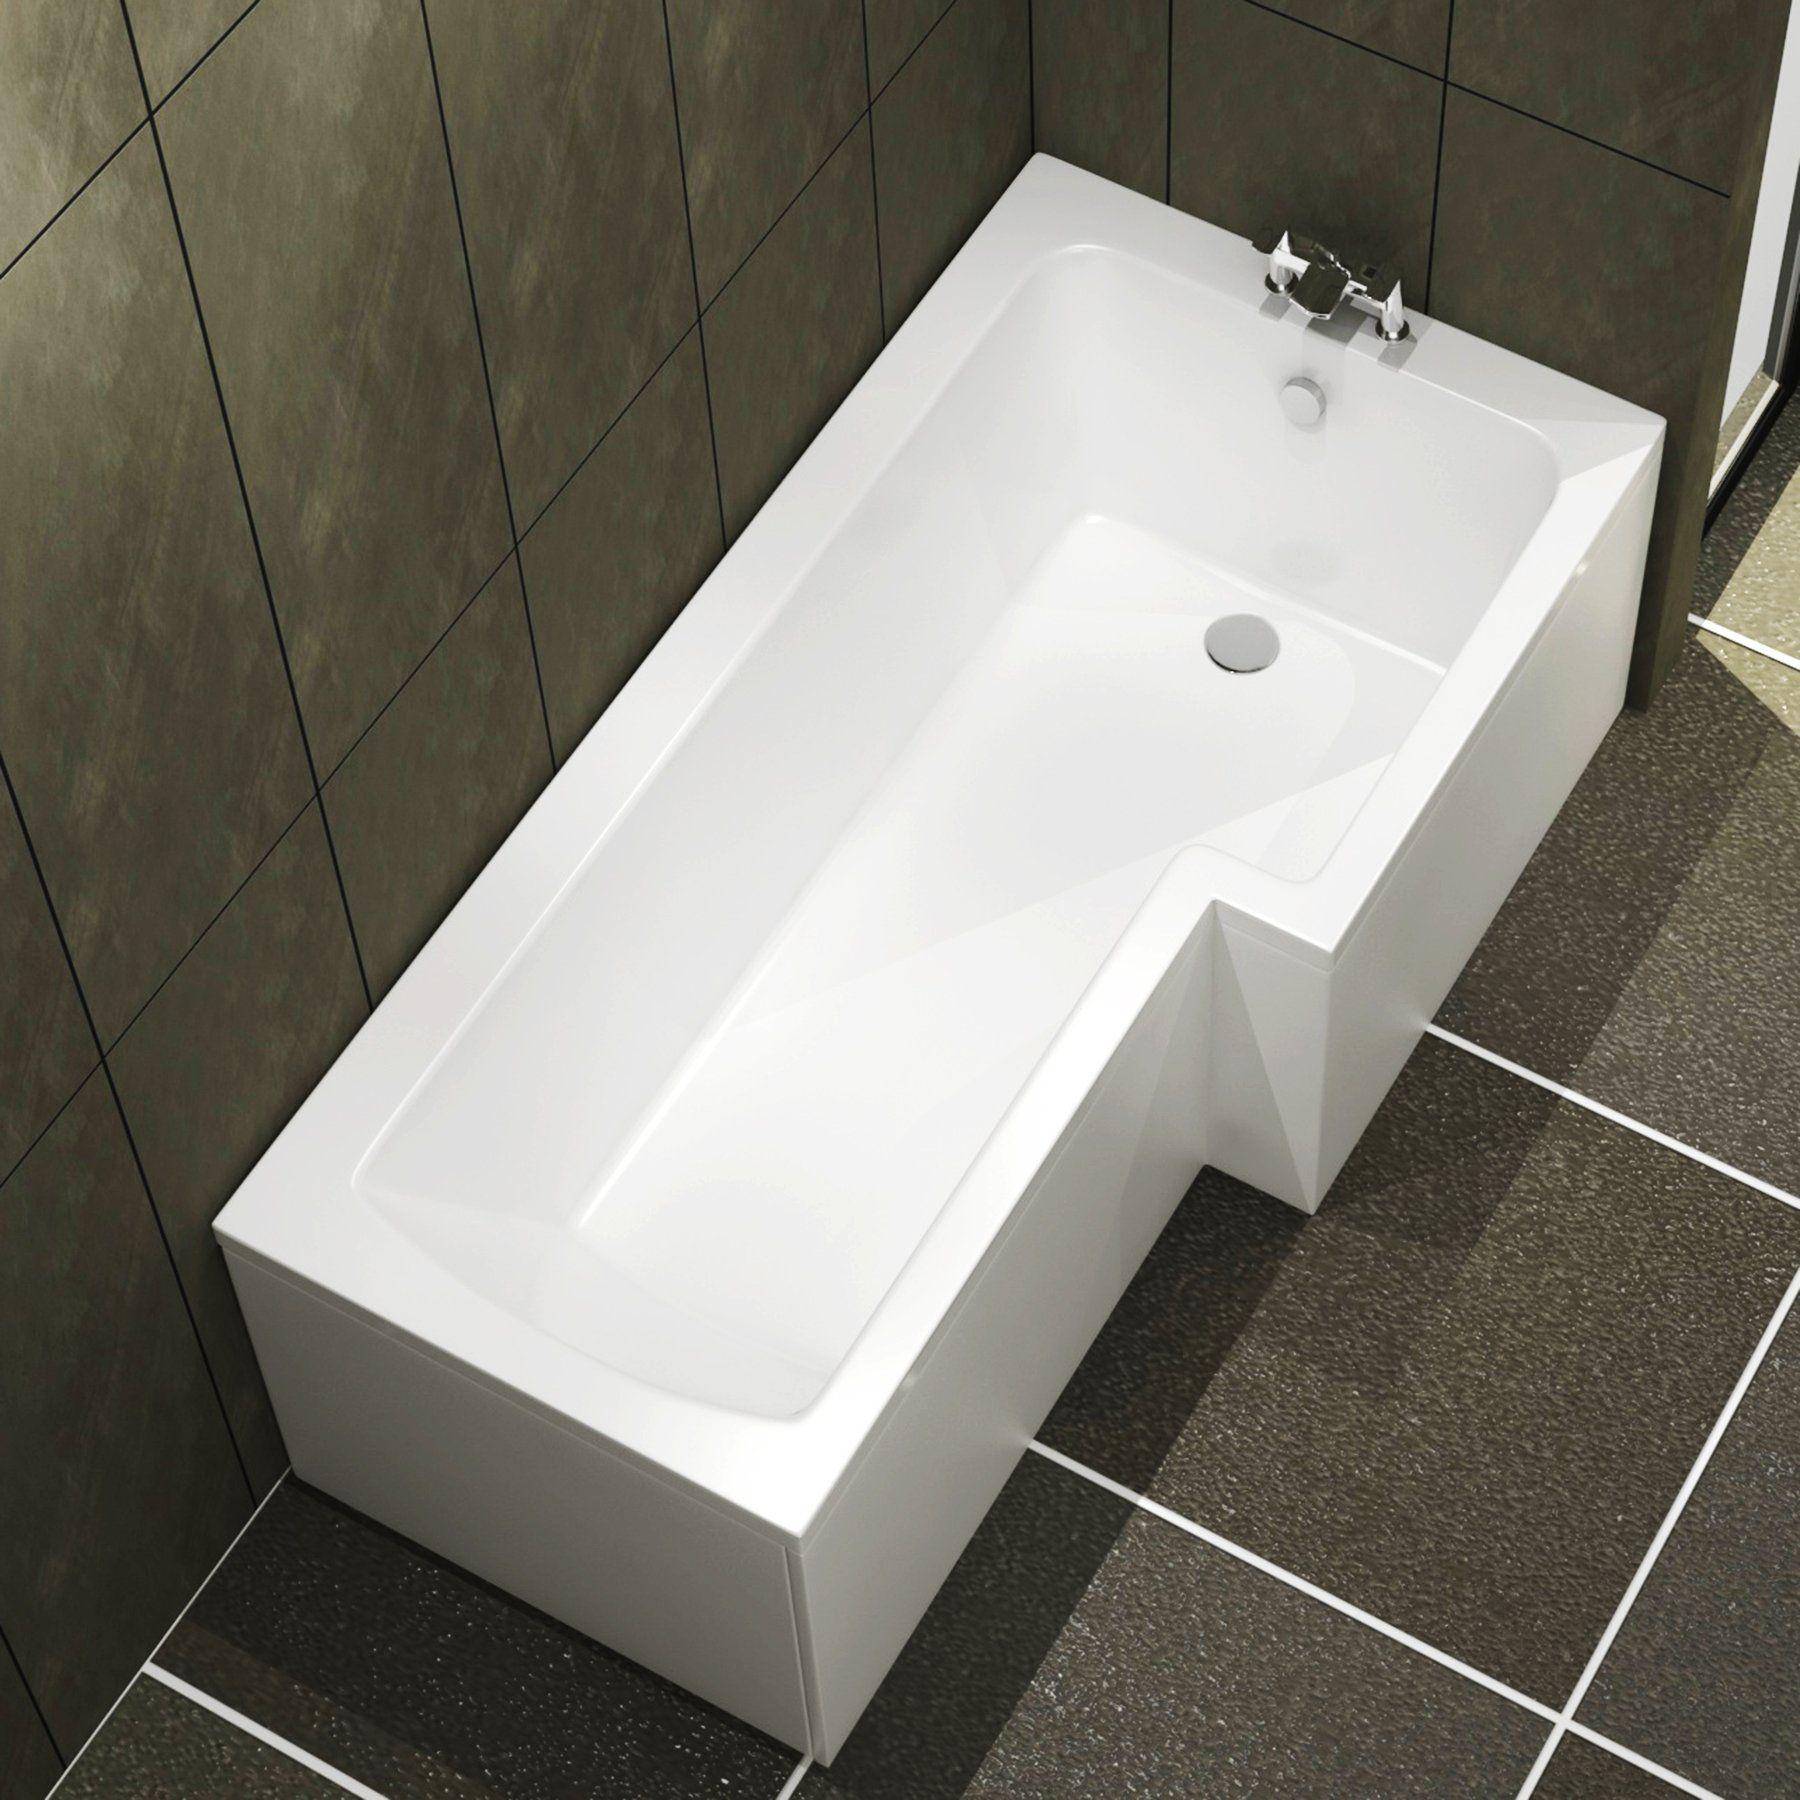 Qubix 1600 X 850mm Right Hand L Shaped Square Shower Bath